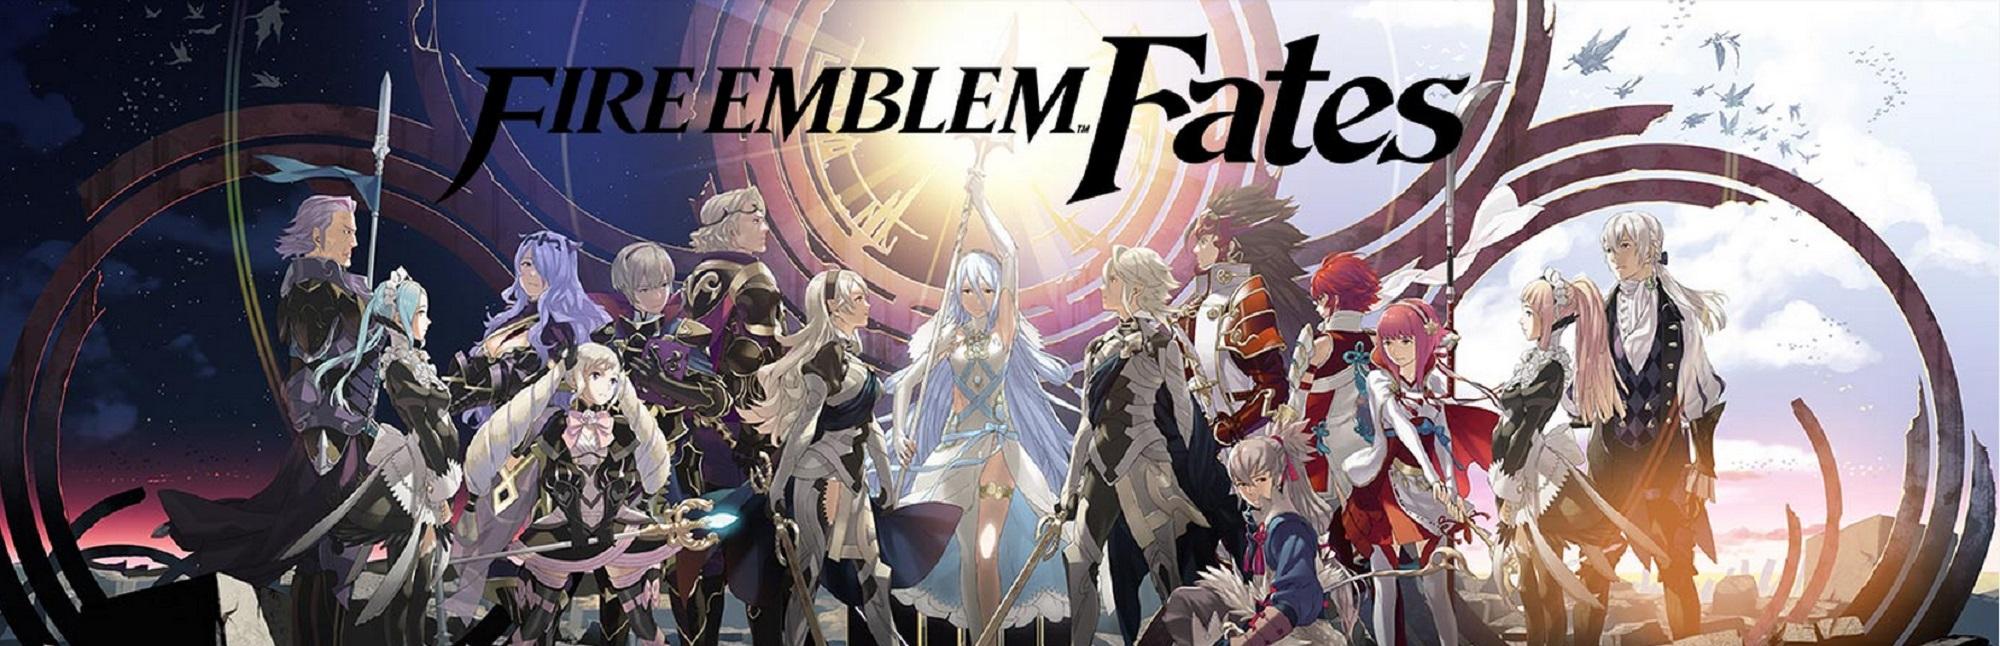 fire-emblem-fates-cast-of-characters-official-artwork-3ds-nintendo